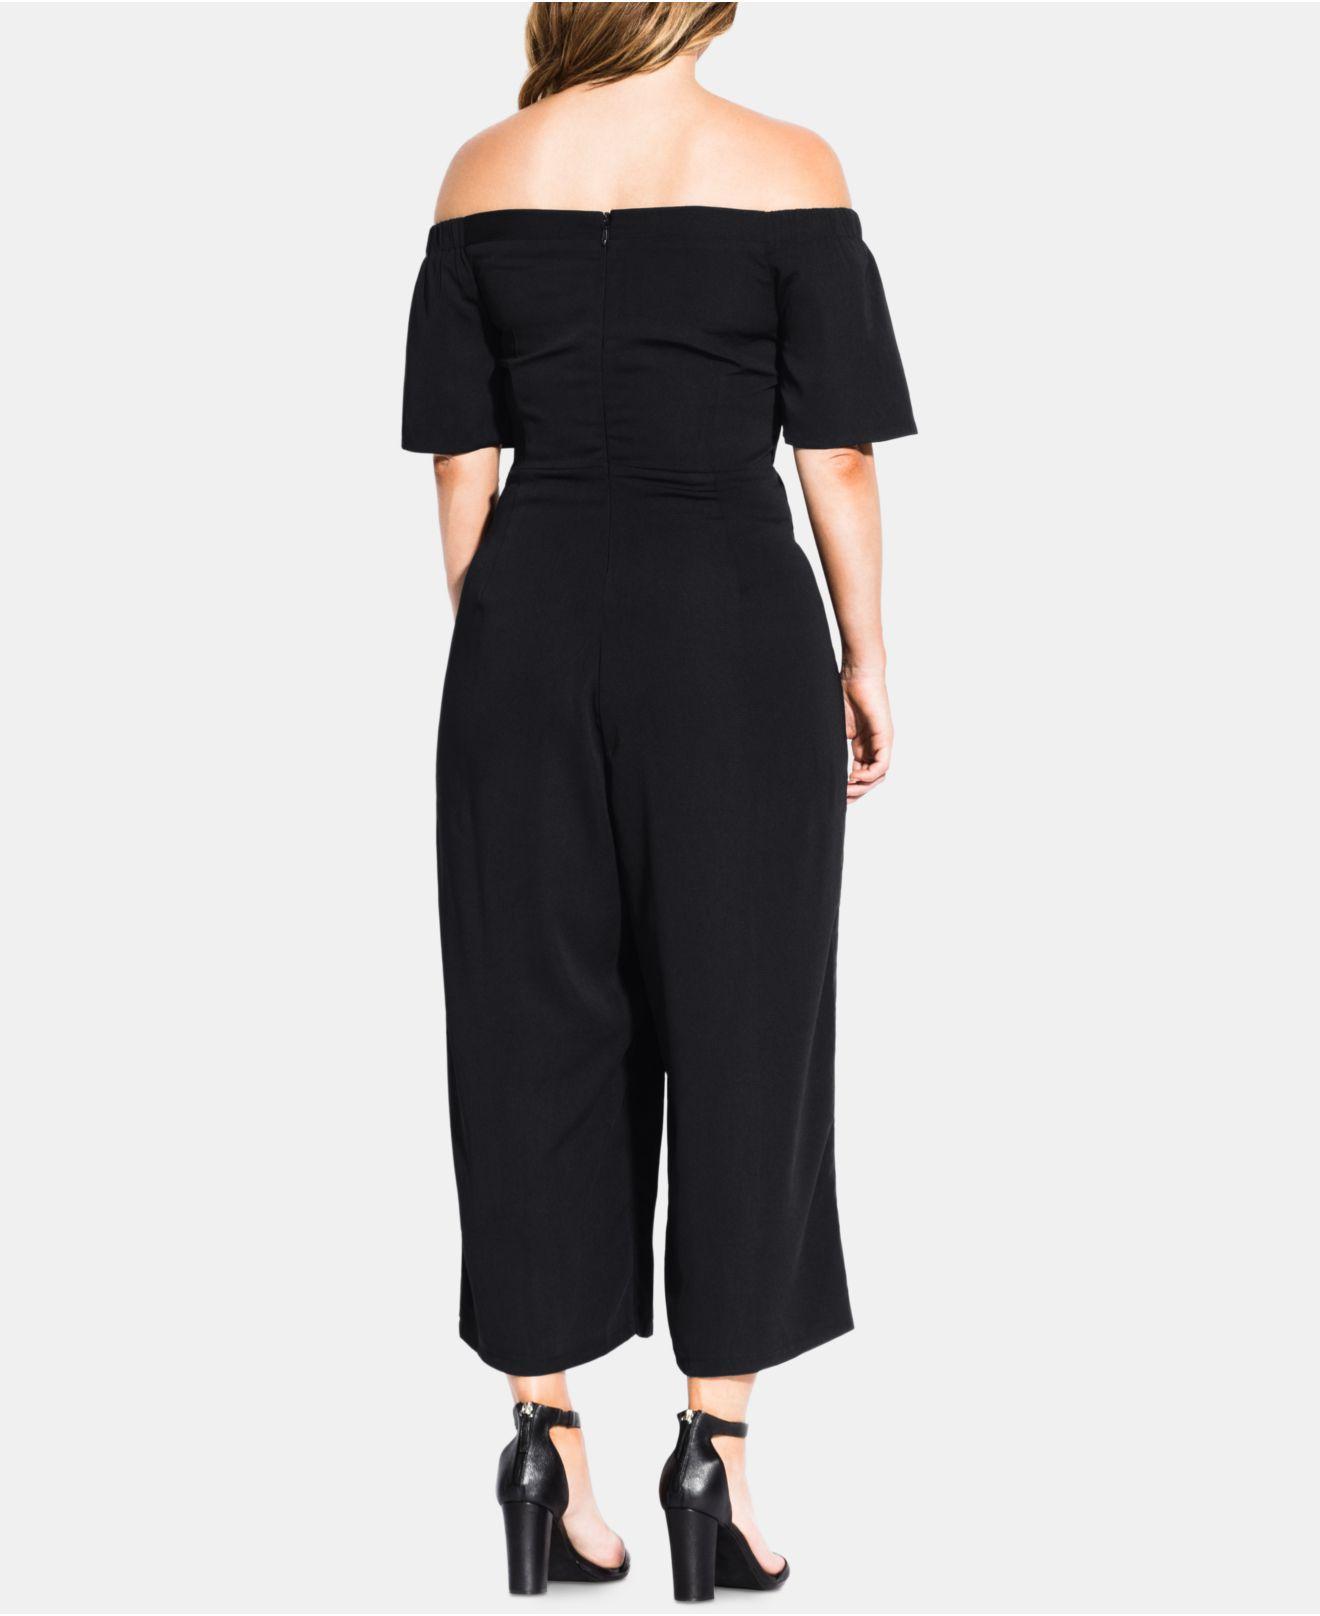 9f46cca5bd Lyst - City Chic Trendy Plus Size Tie-waist Jumpsuit in Black